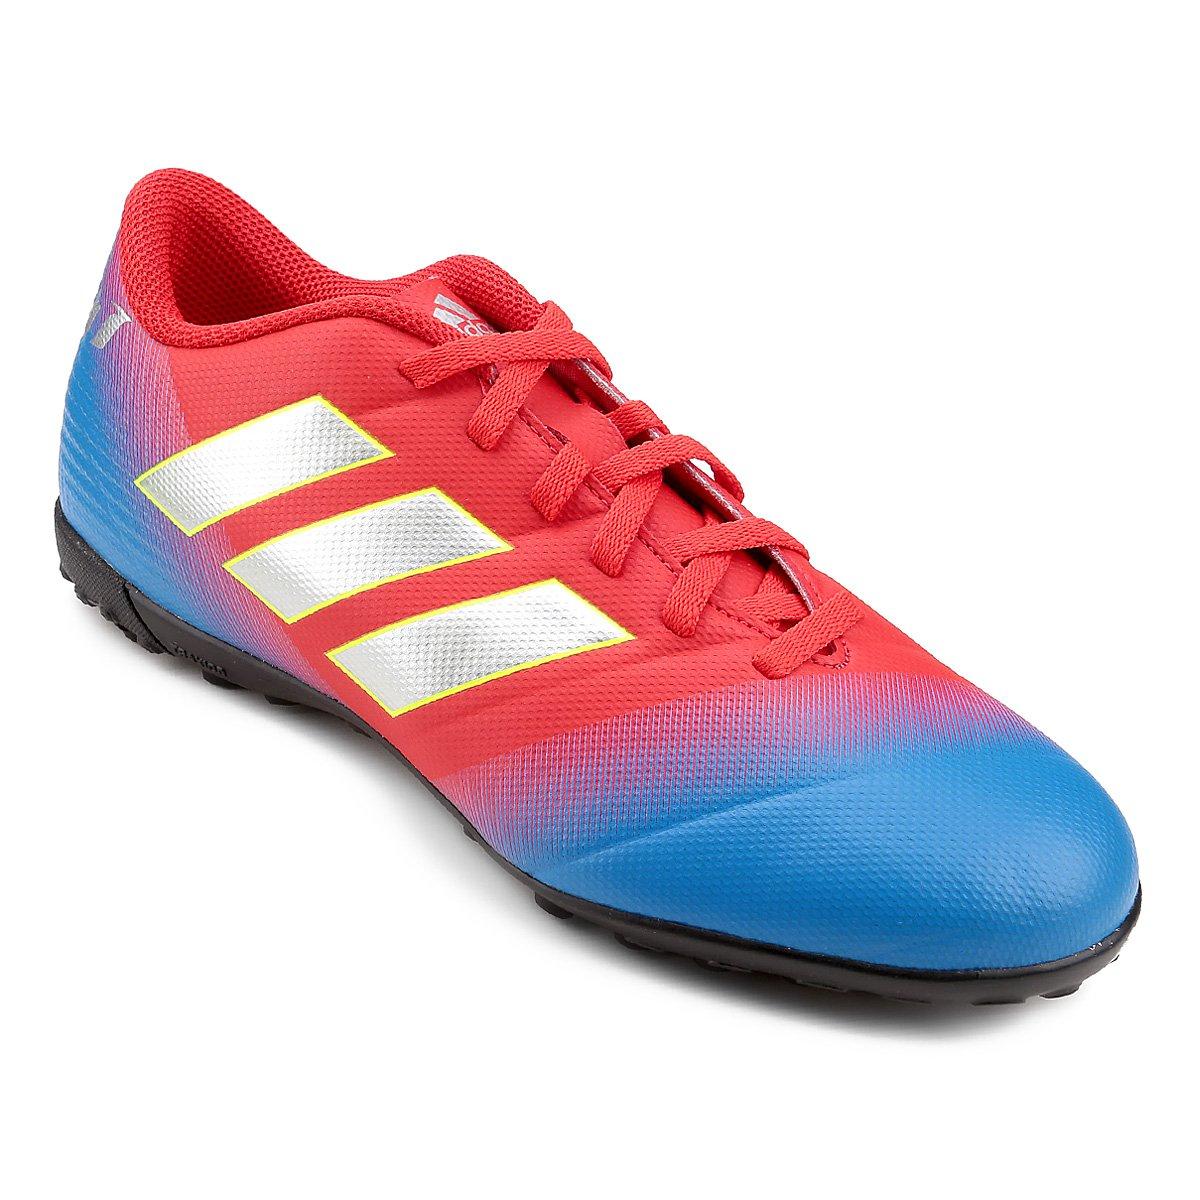 15c41256b9221 Chuteira Society Adidas Nemeziz Messi 18 4 TF - Compre Agora